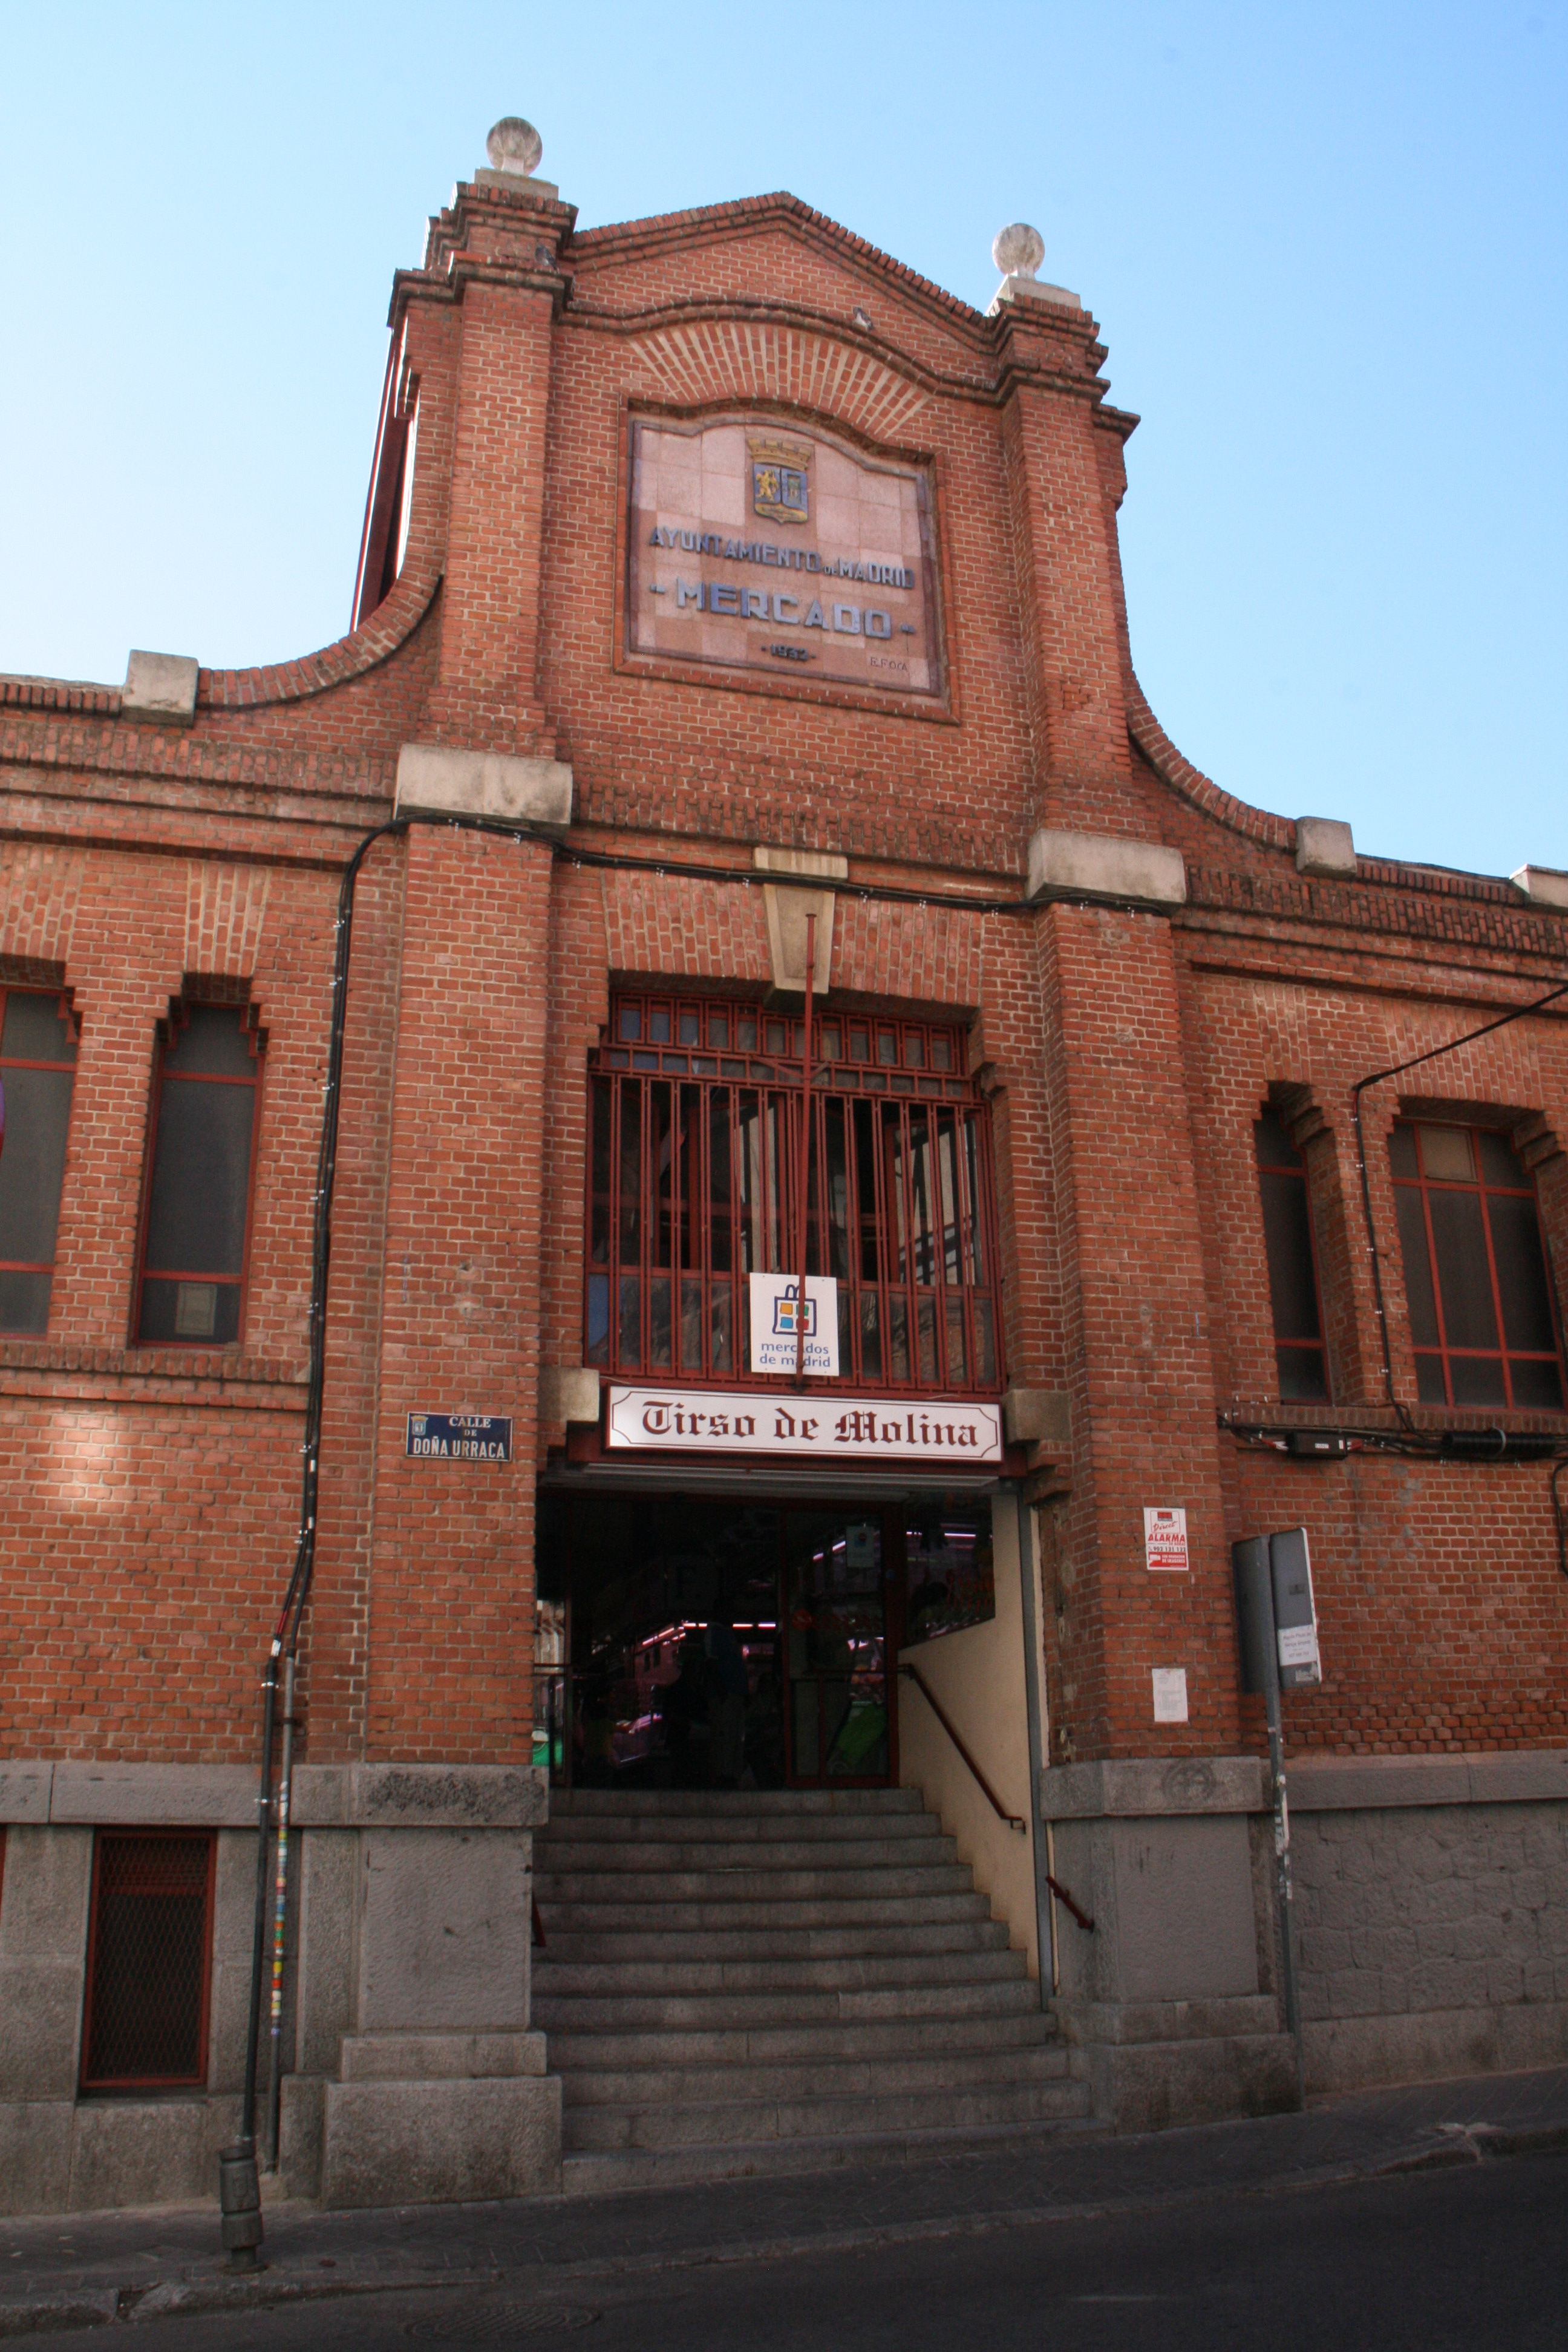 mercados abastos Madrid - Tirso de Molina